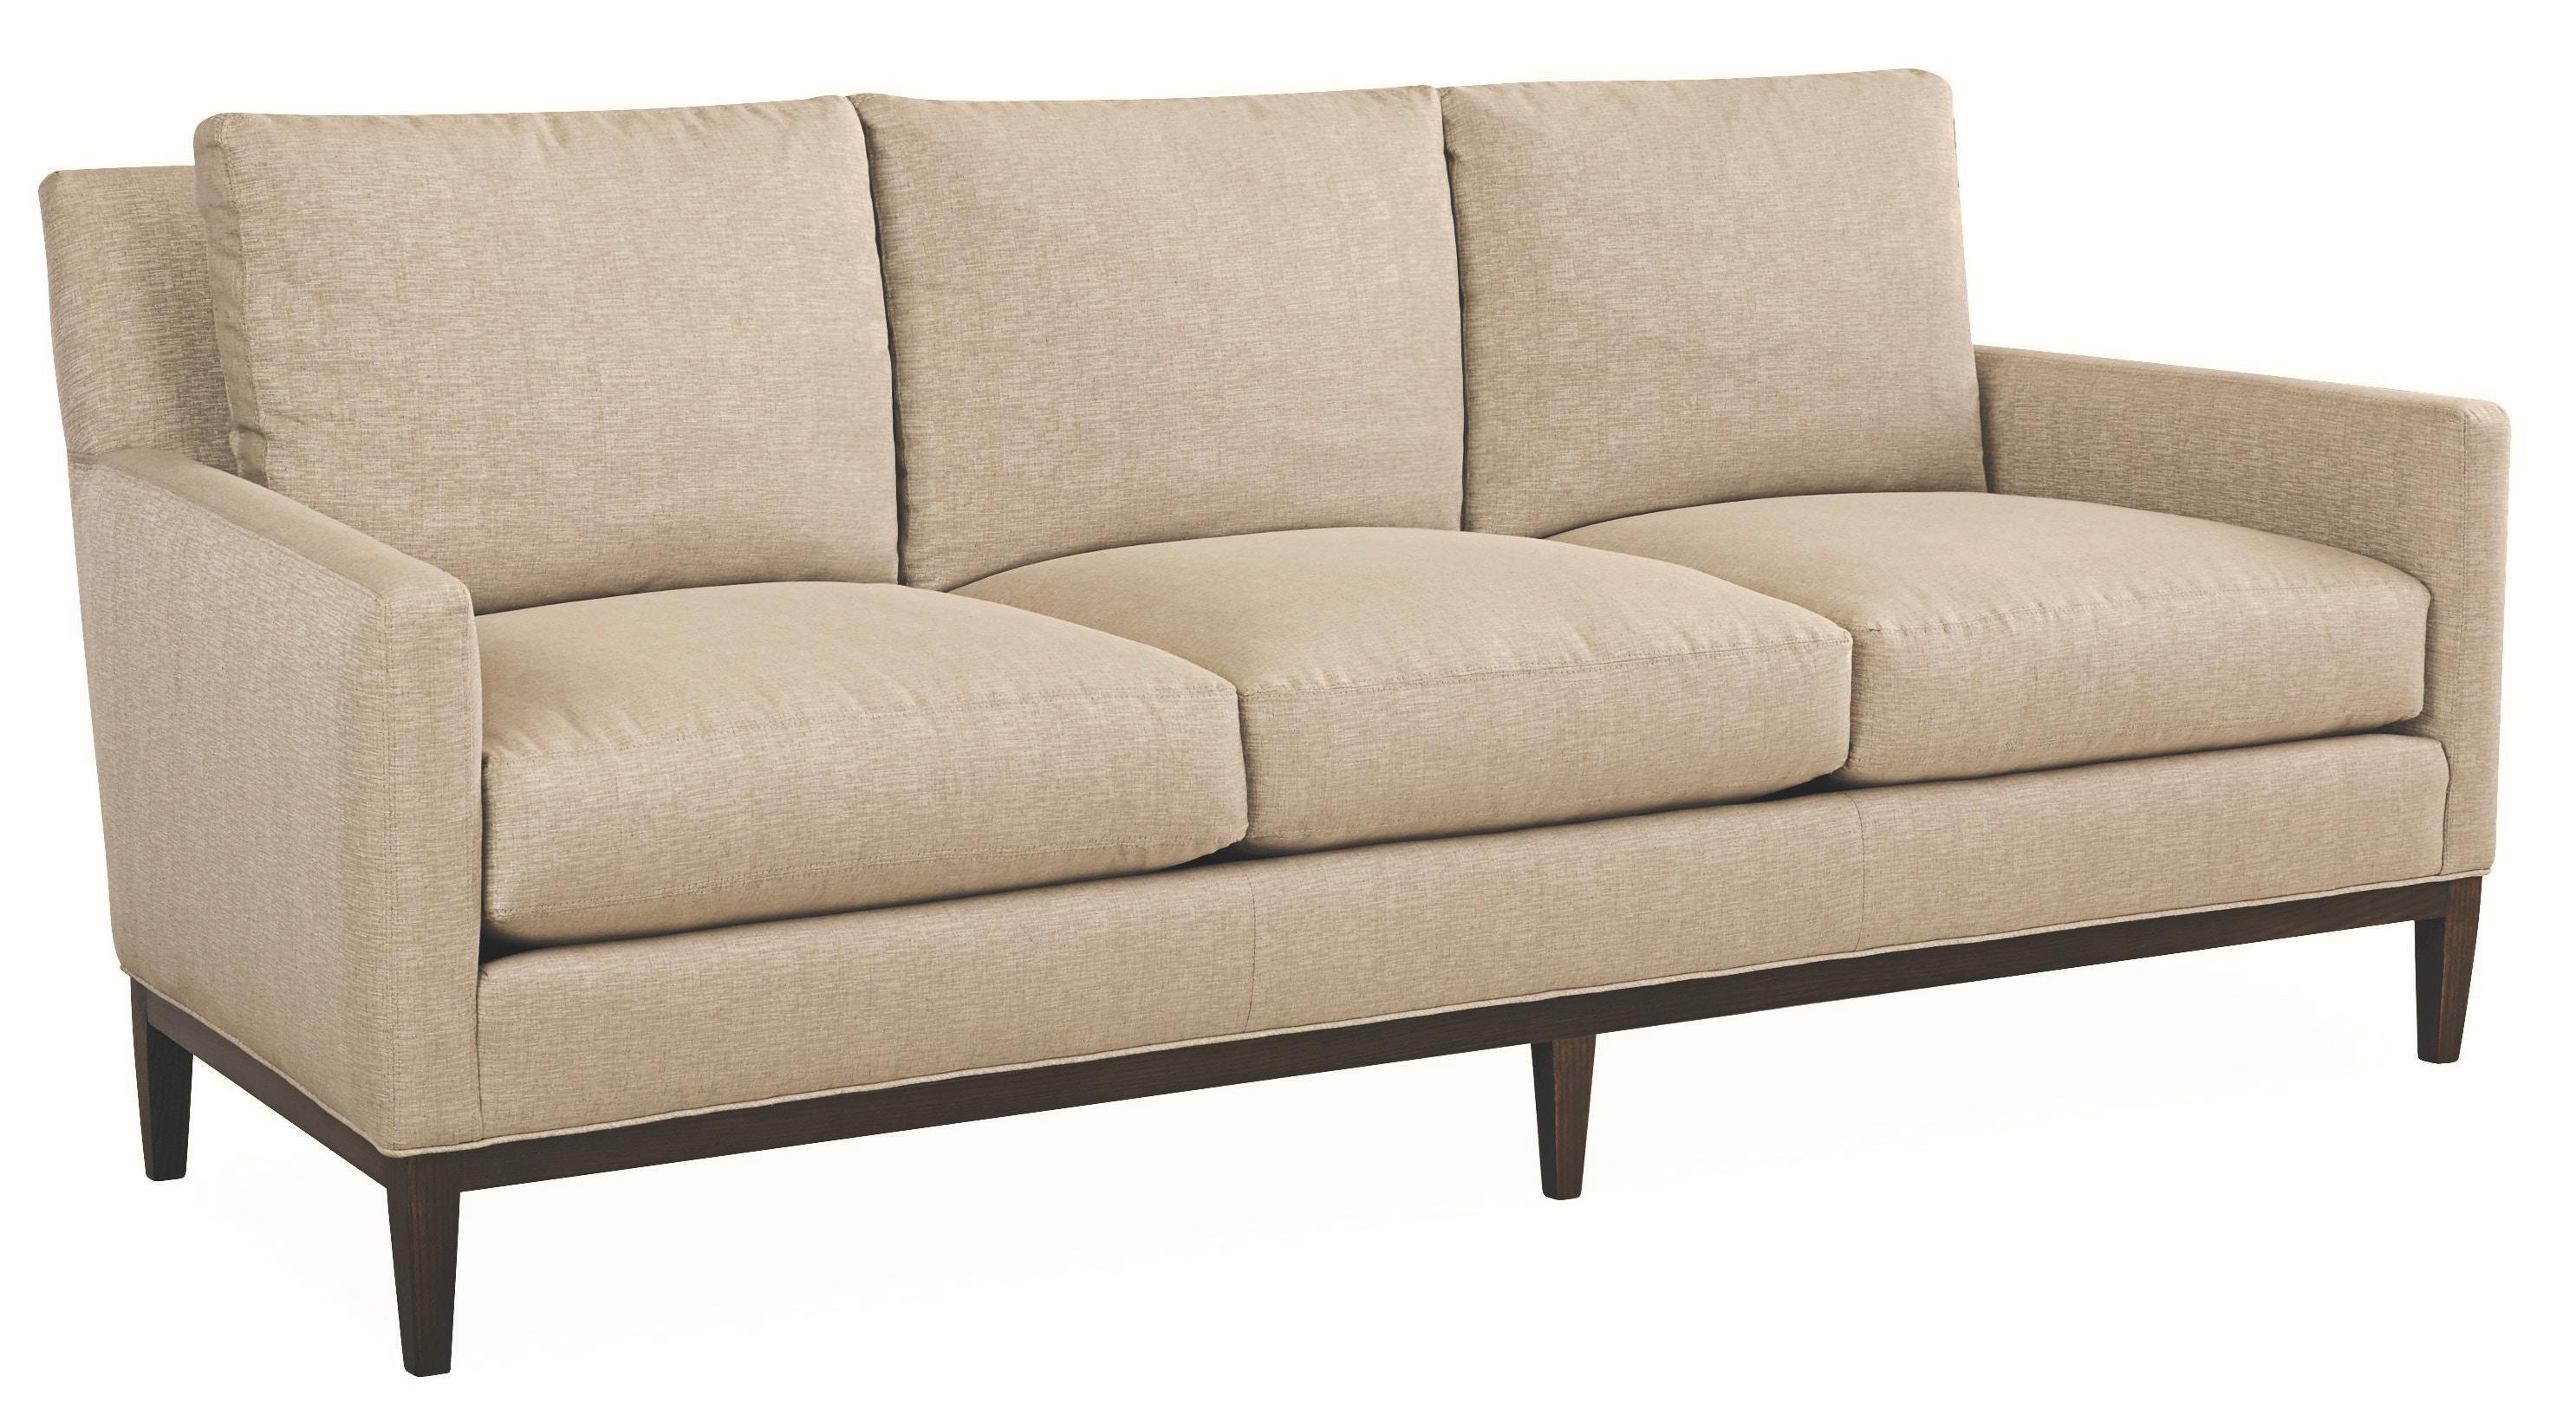 Charming Lee Industries Living Room Sofa 1399 03   Meg Brown Home Furnishings    Advance, Winston Salem, Greensboro And Lexington, NC